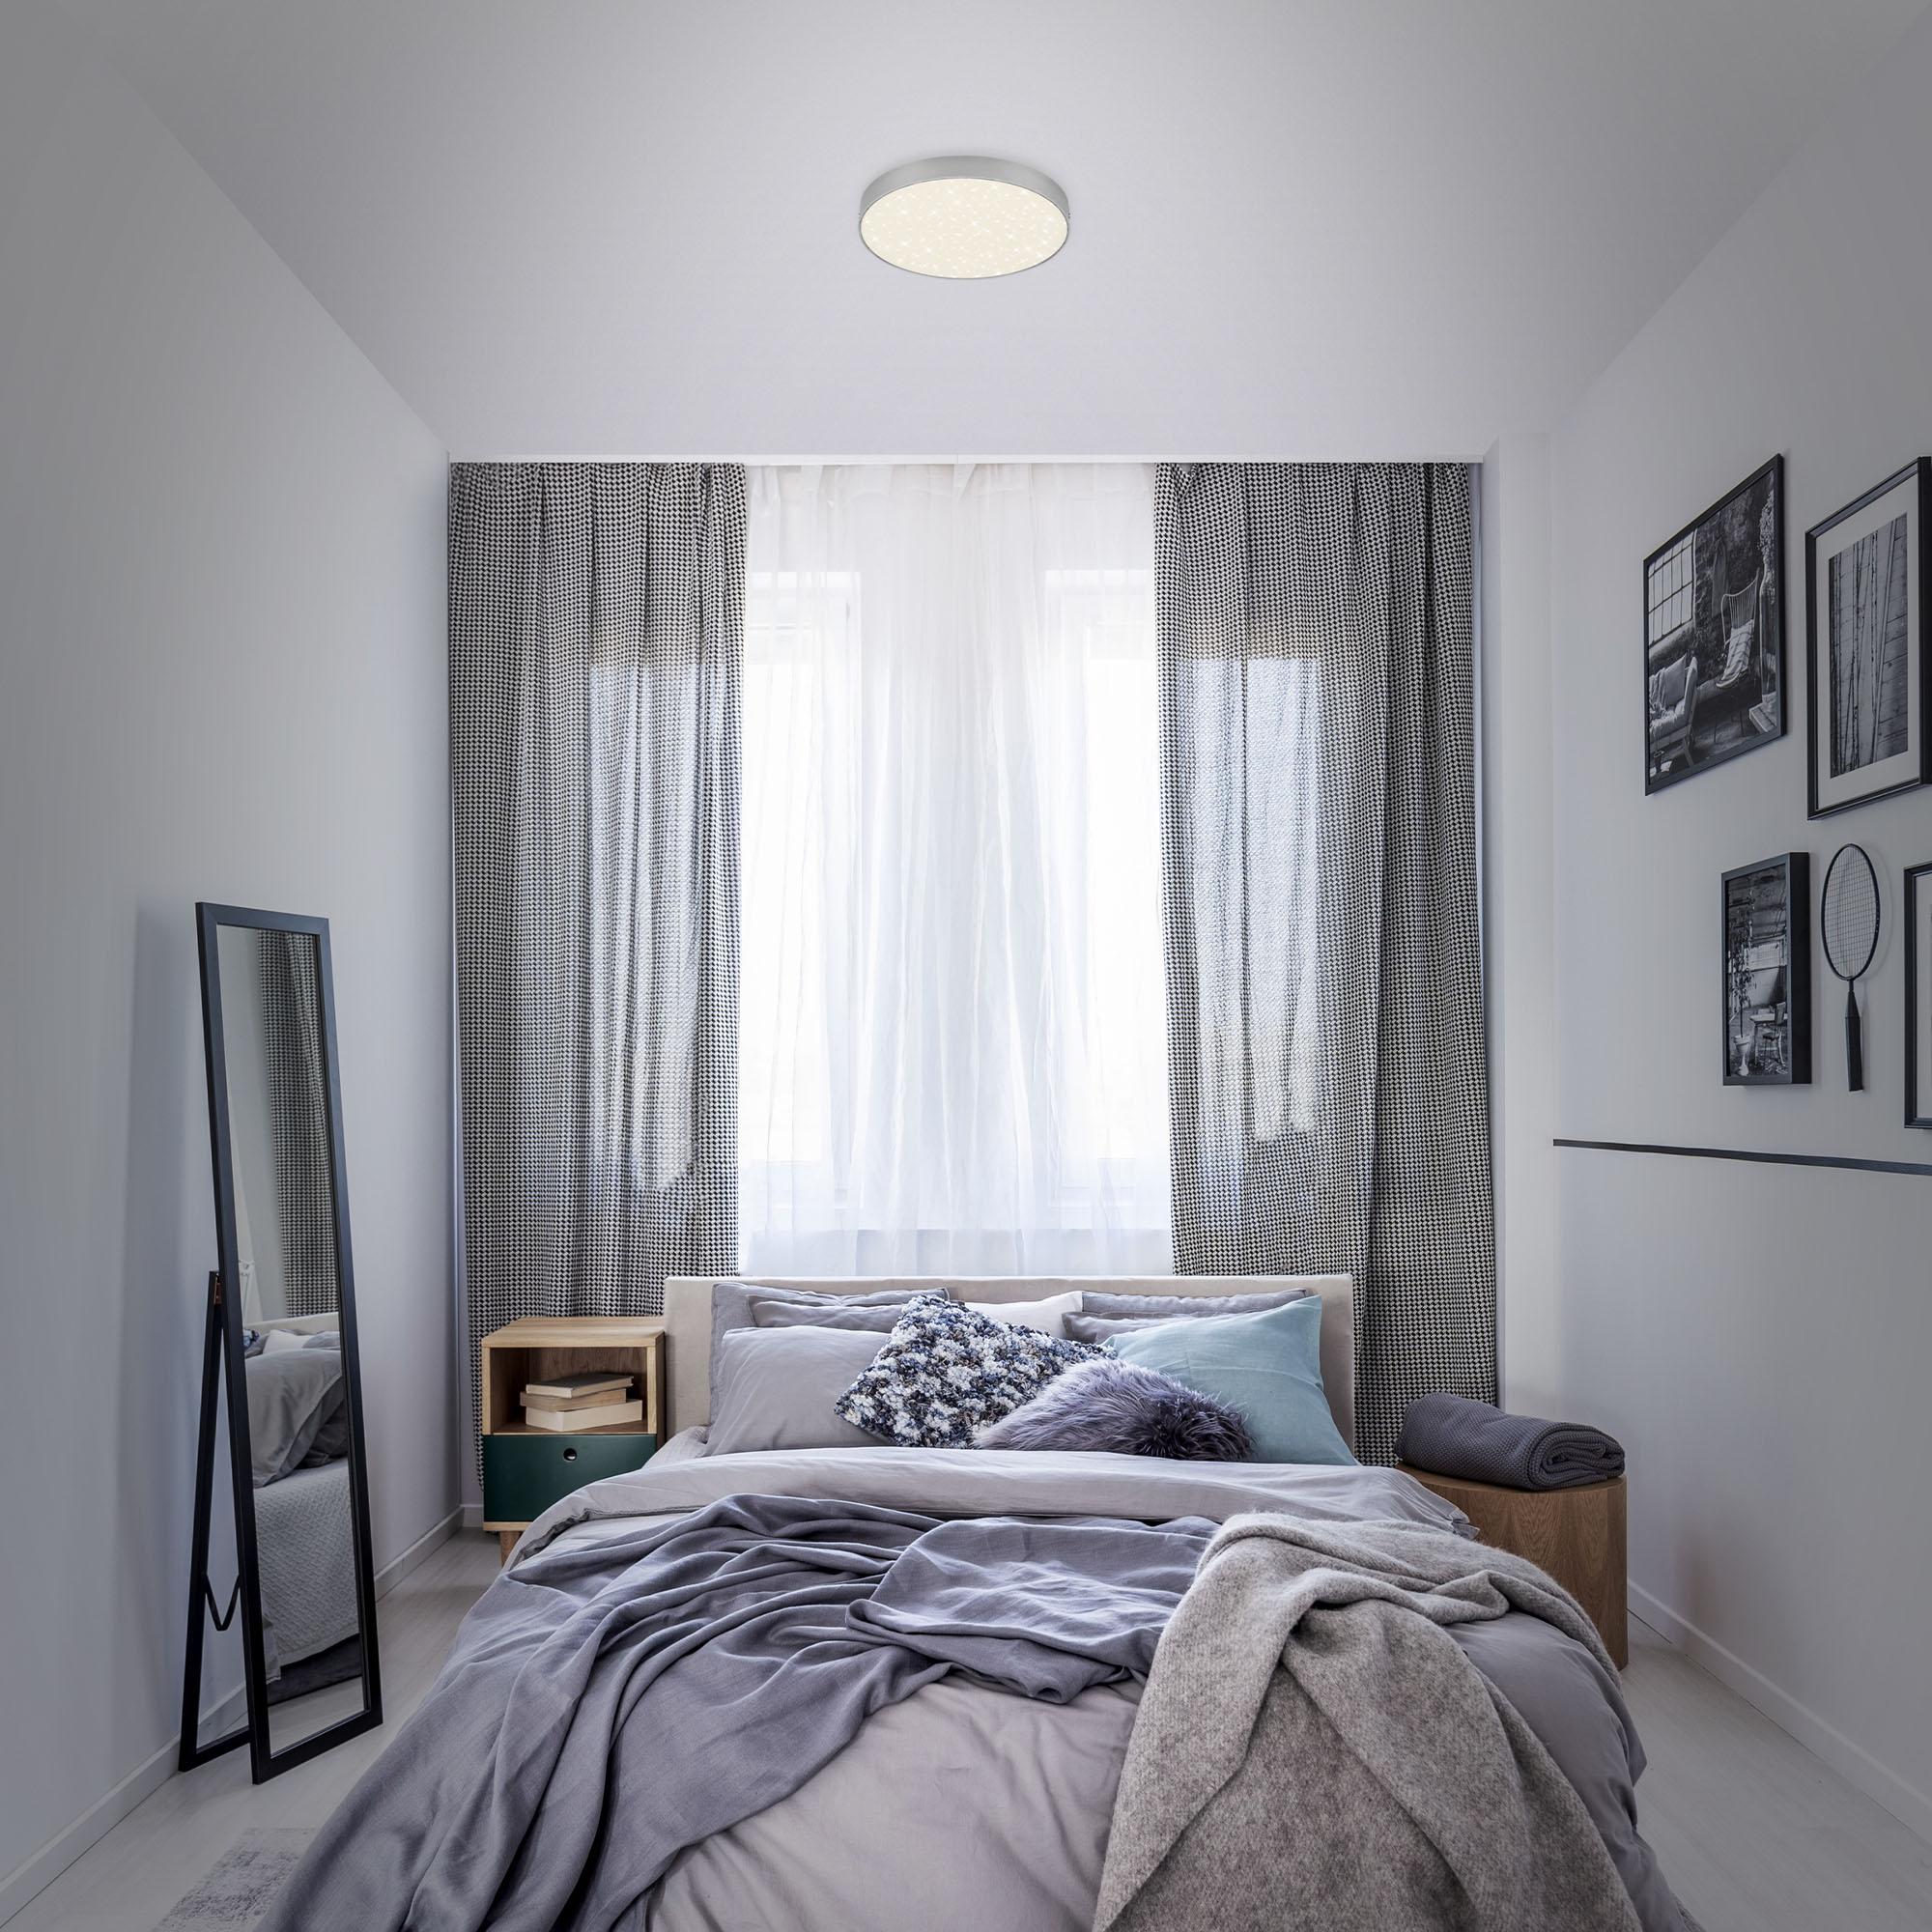 STERNENHIMMEL LED Deckenleuchte, Ø 21,2 cm, 16 W, Silber